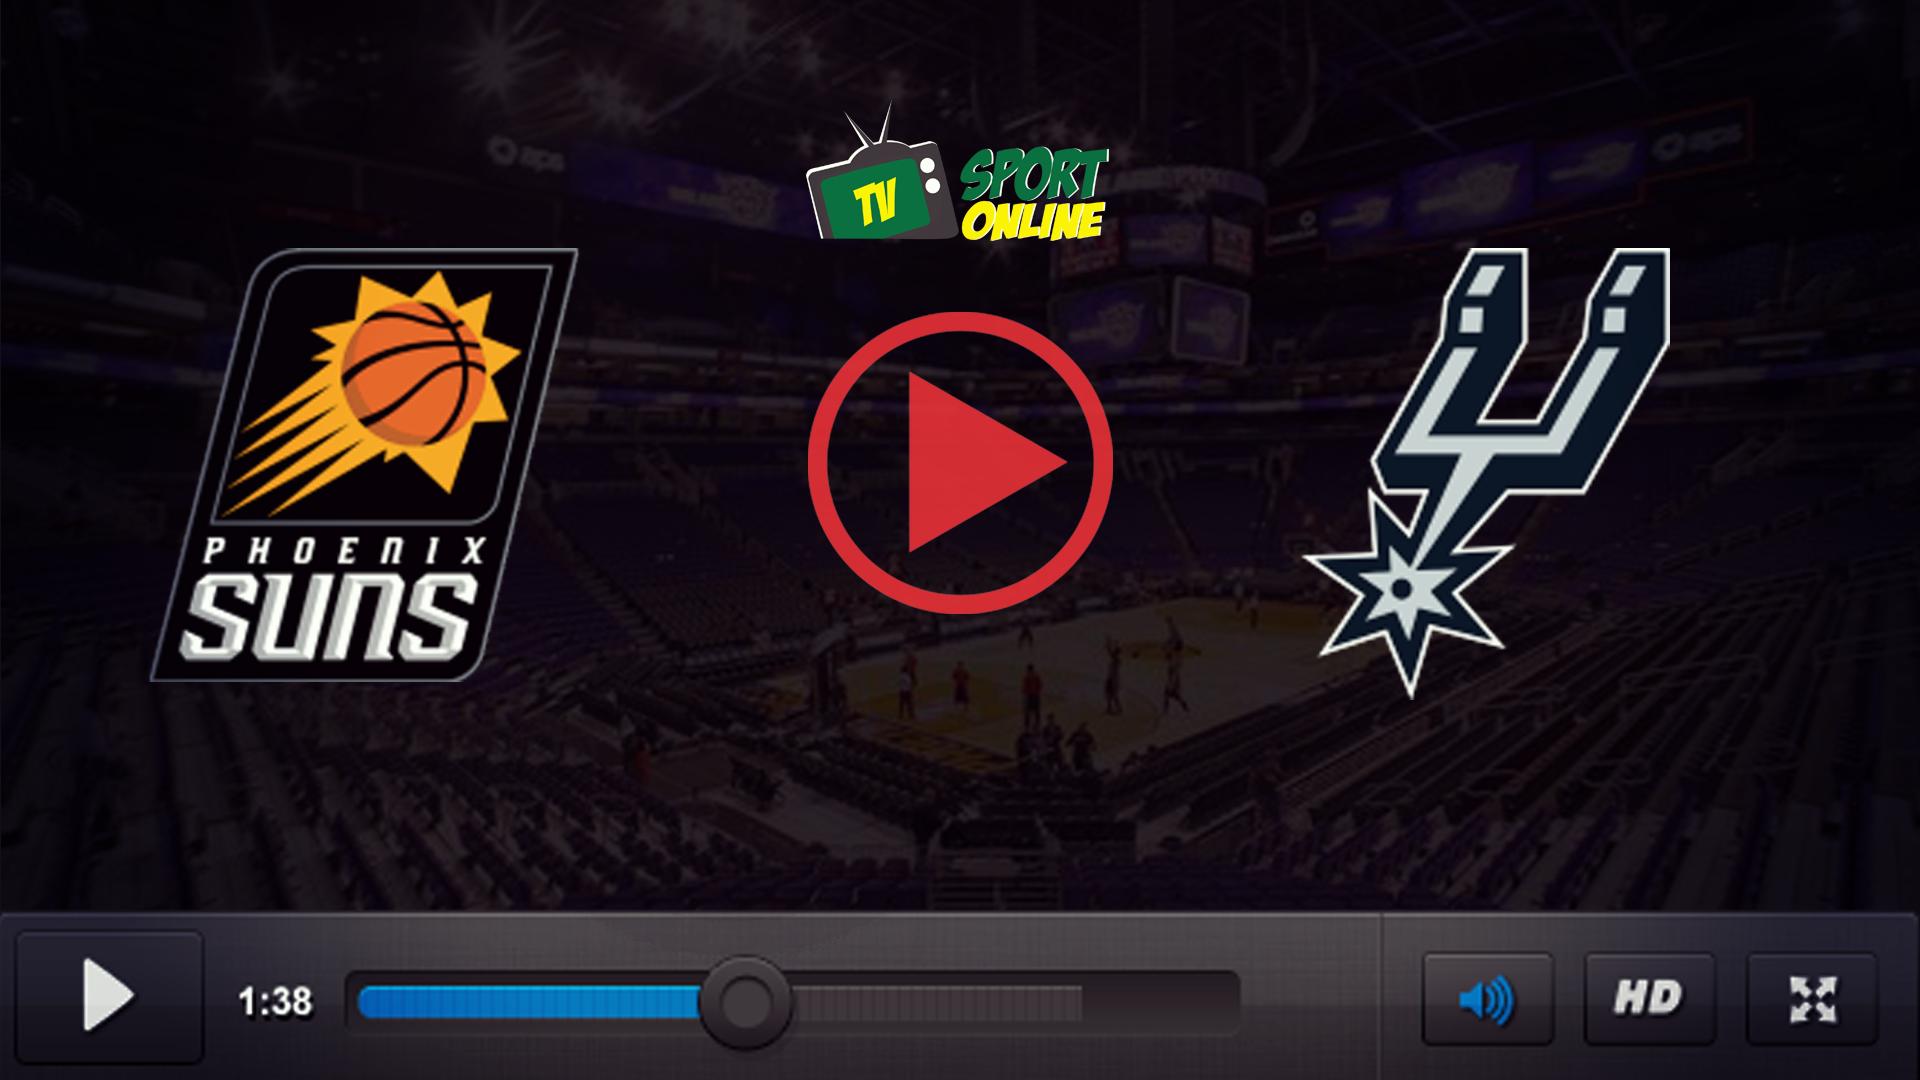 Watch Live Stream Phoenix Suns – San Antonio Spurs